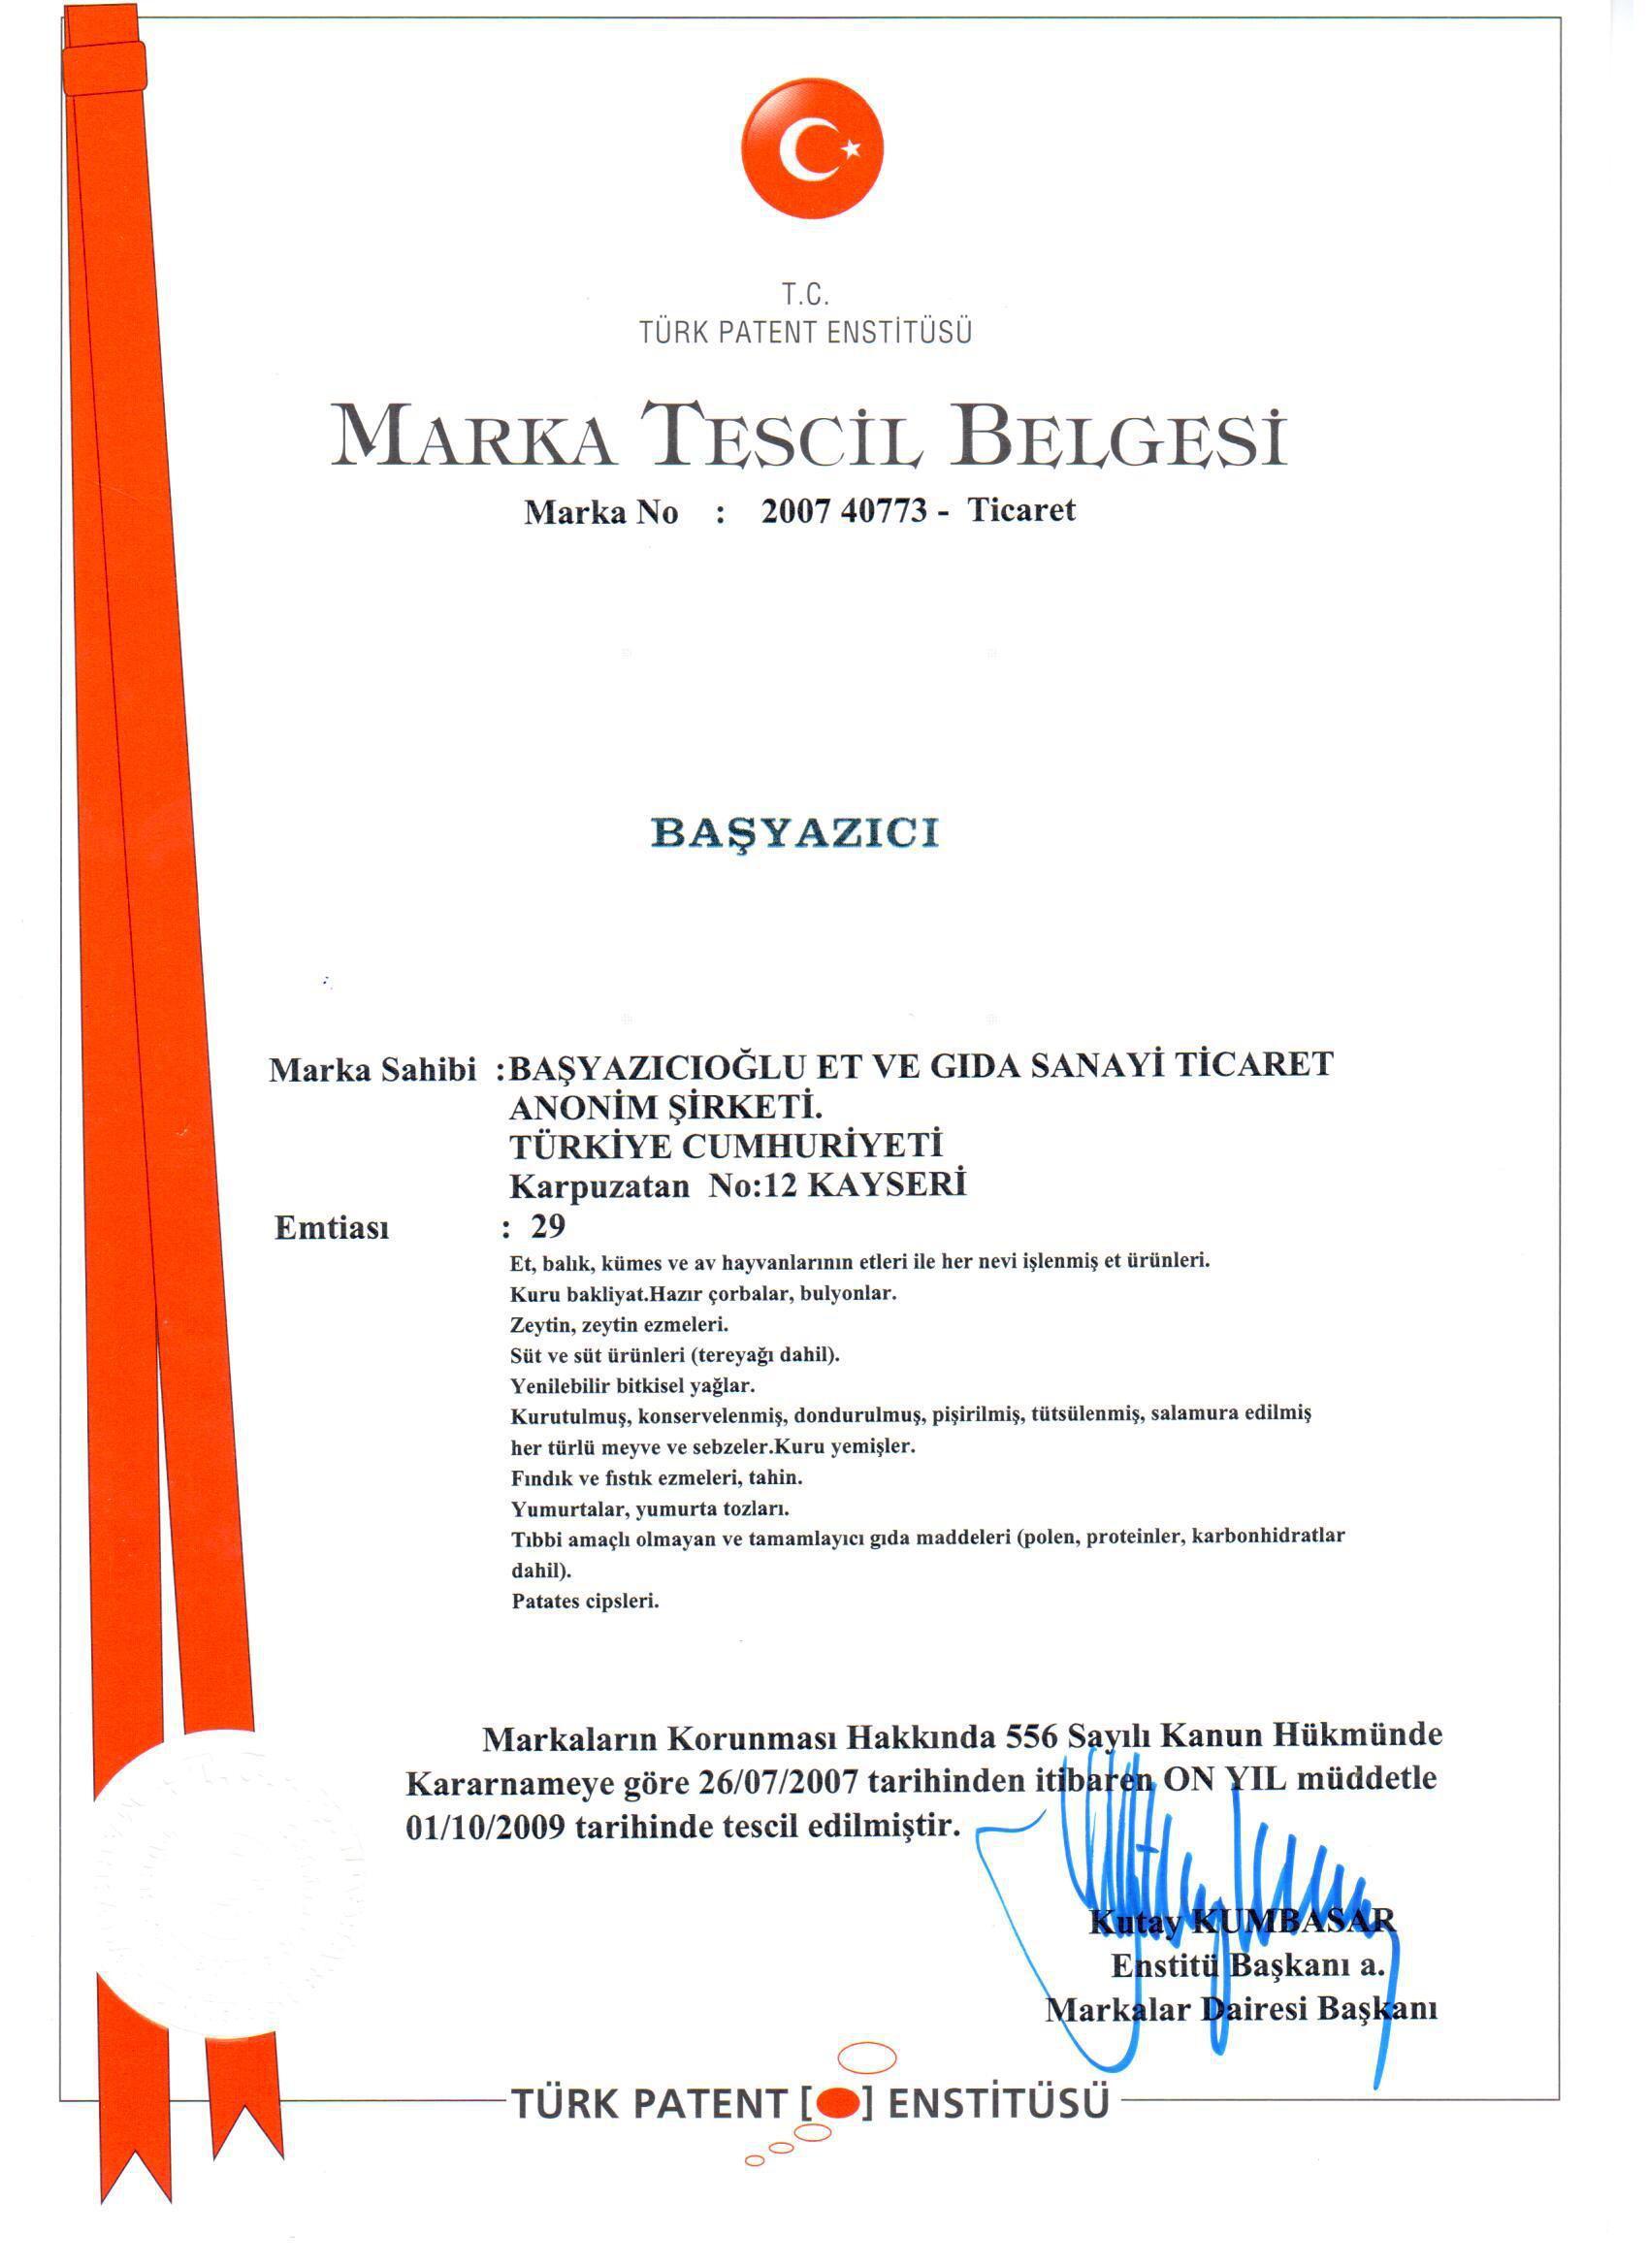 BAŞYAZICI_MARKA_TESCİL.jpg (261 KB)